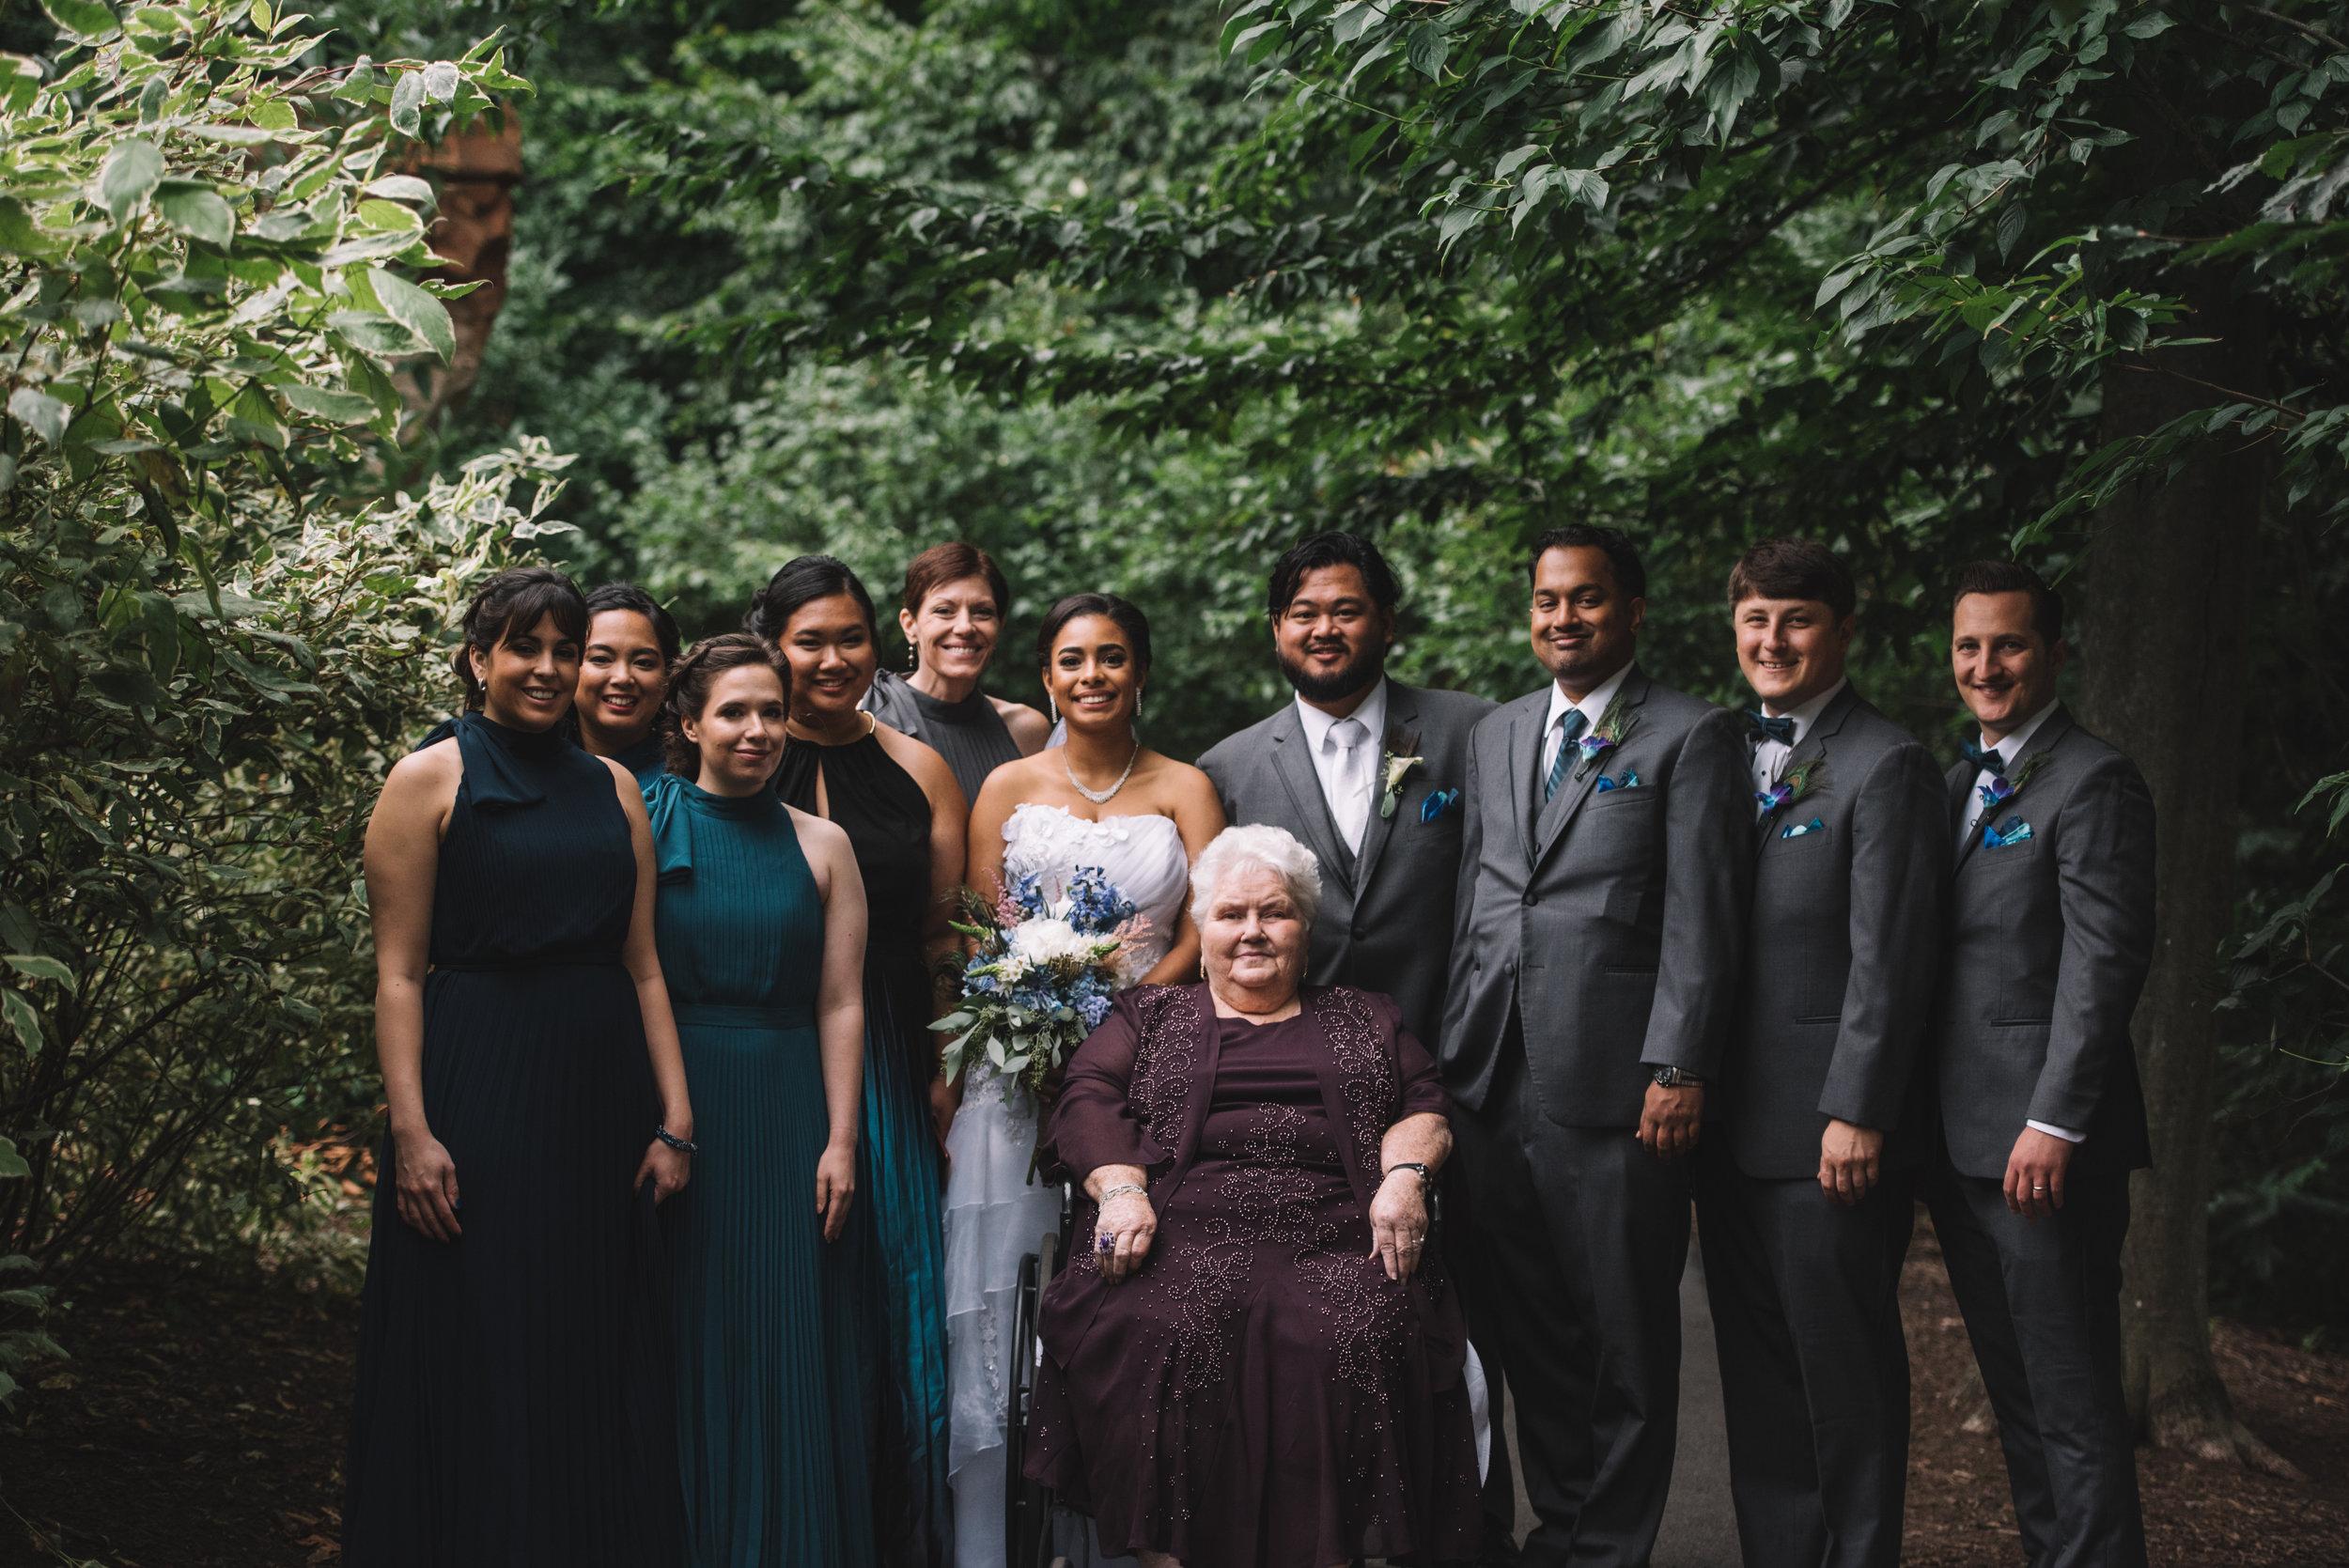 WeddingPhotos | NJPhotographer | Highlights-8-18.jpg